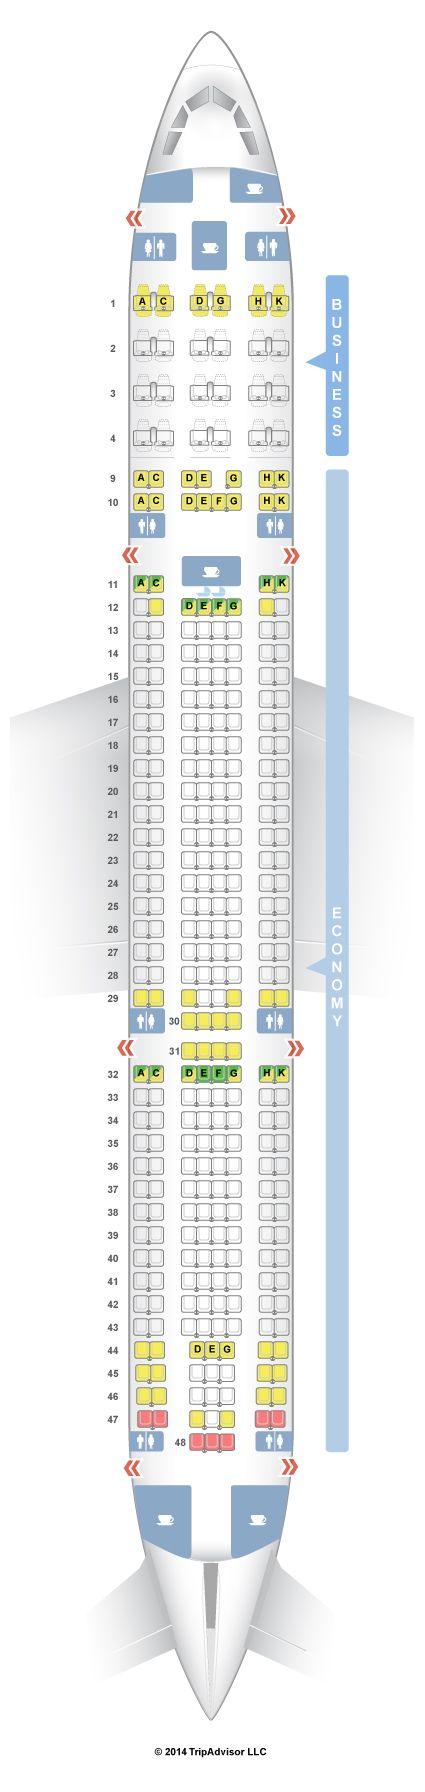 SeatGuru Seat Map Aer Lingus Airbus A330-300 (330)